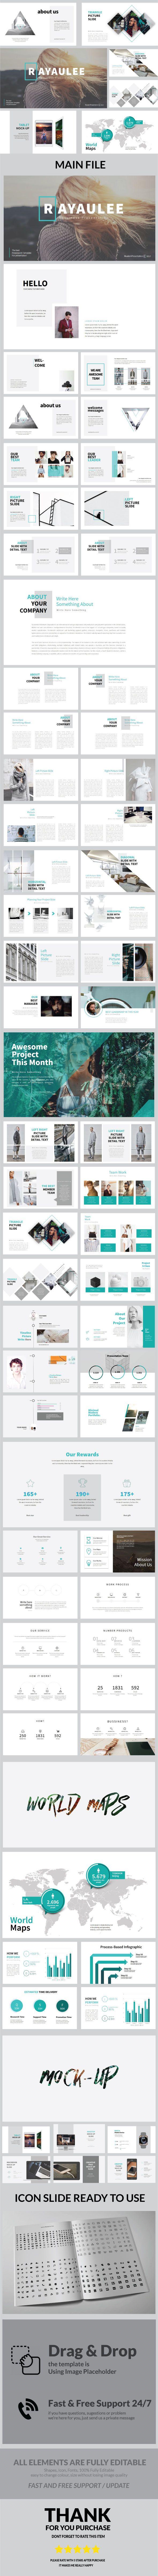 Raya Ulee Multipurpose Powerpoint Template